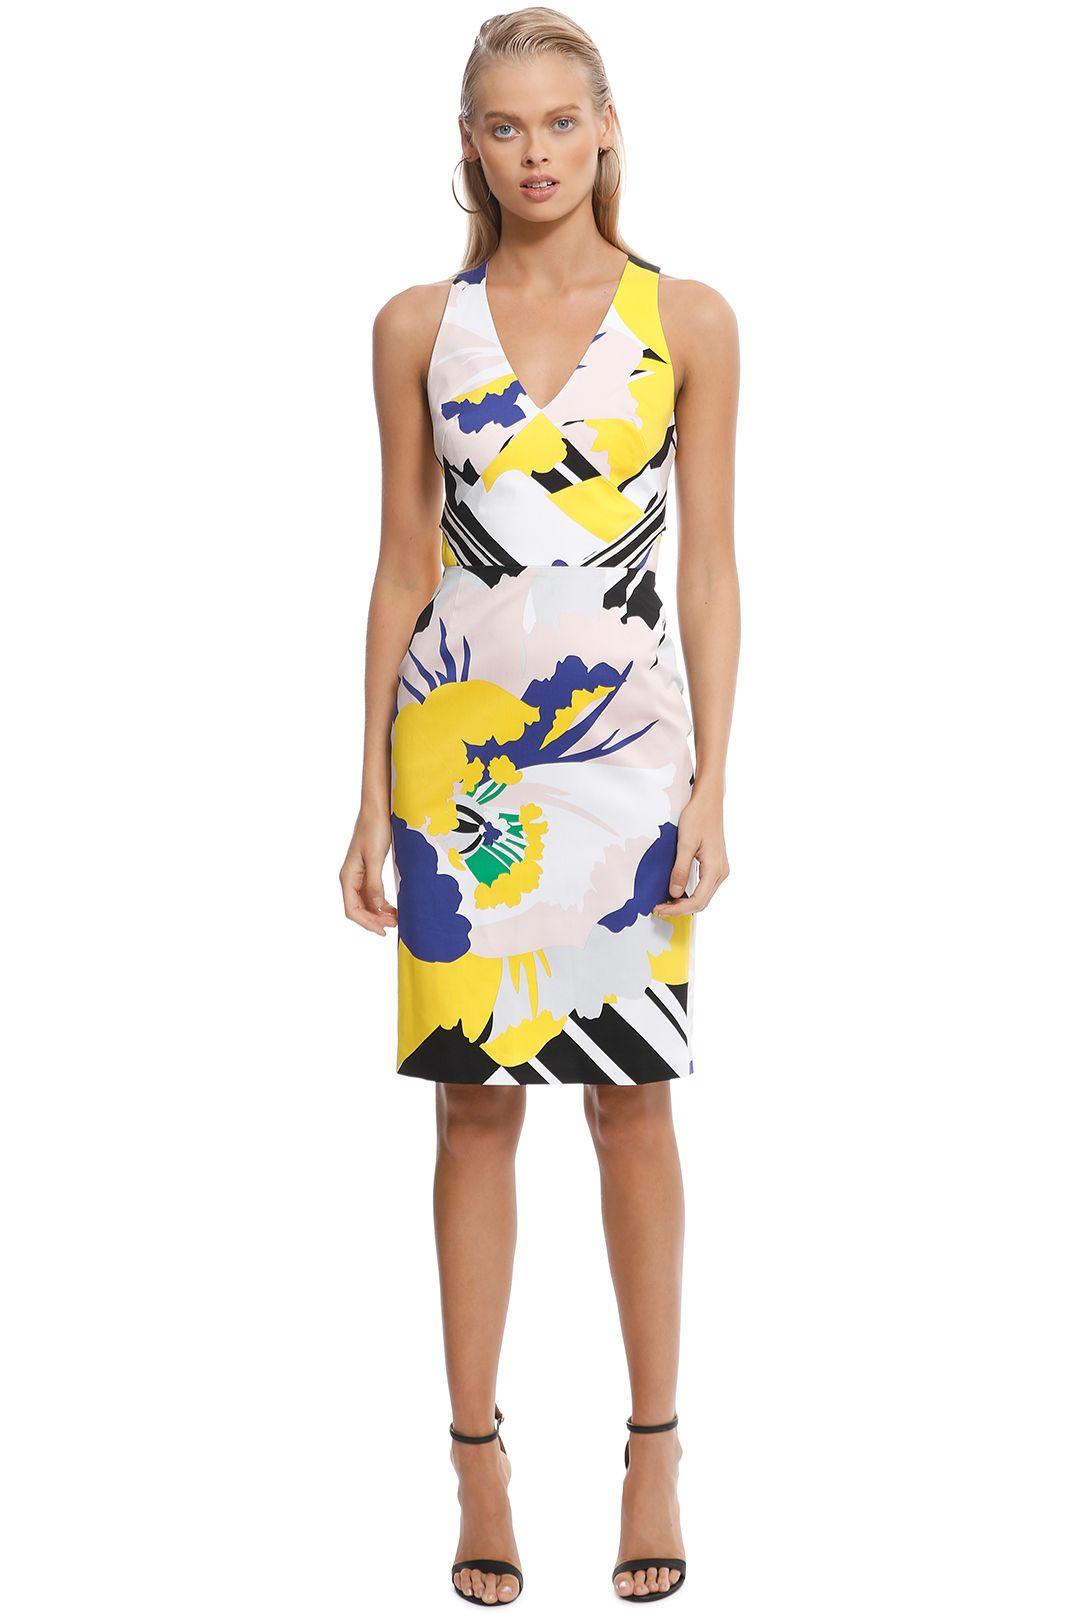 Karen Millen - Blue Flower Stripe Dress - Front